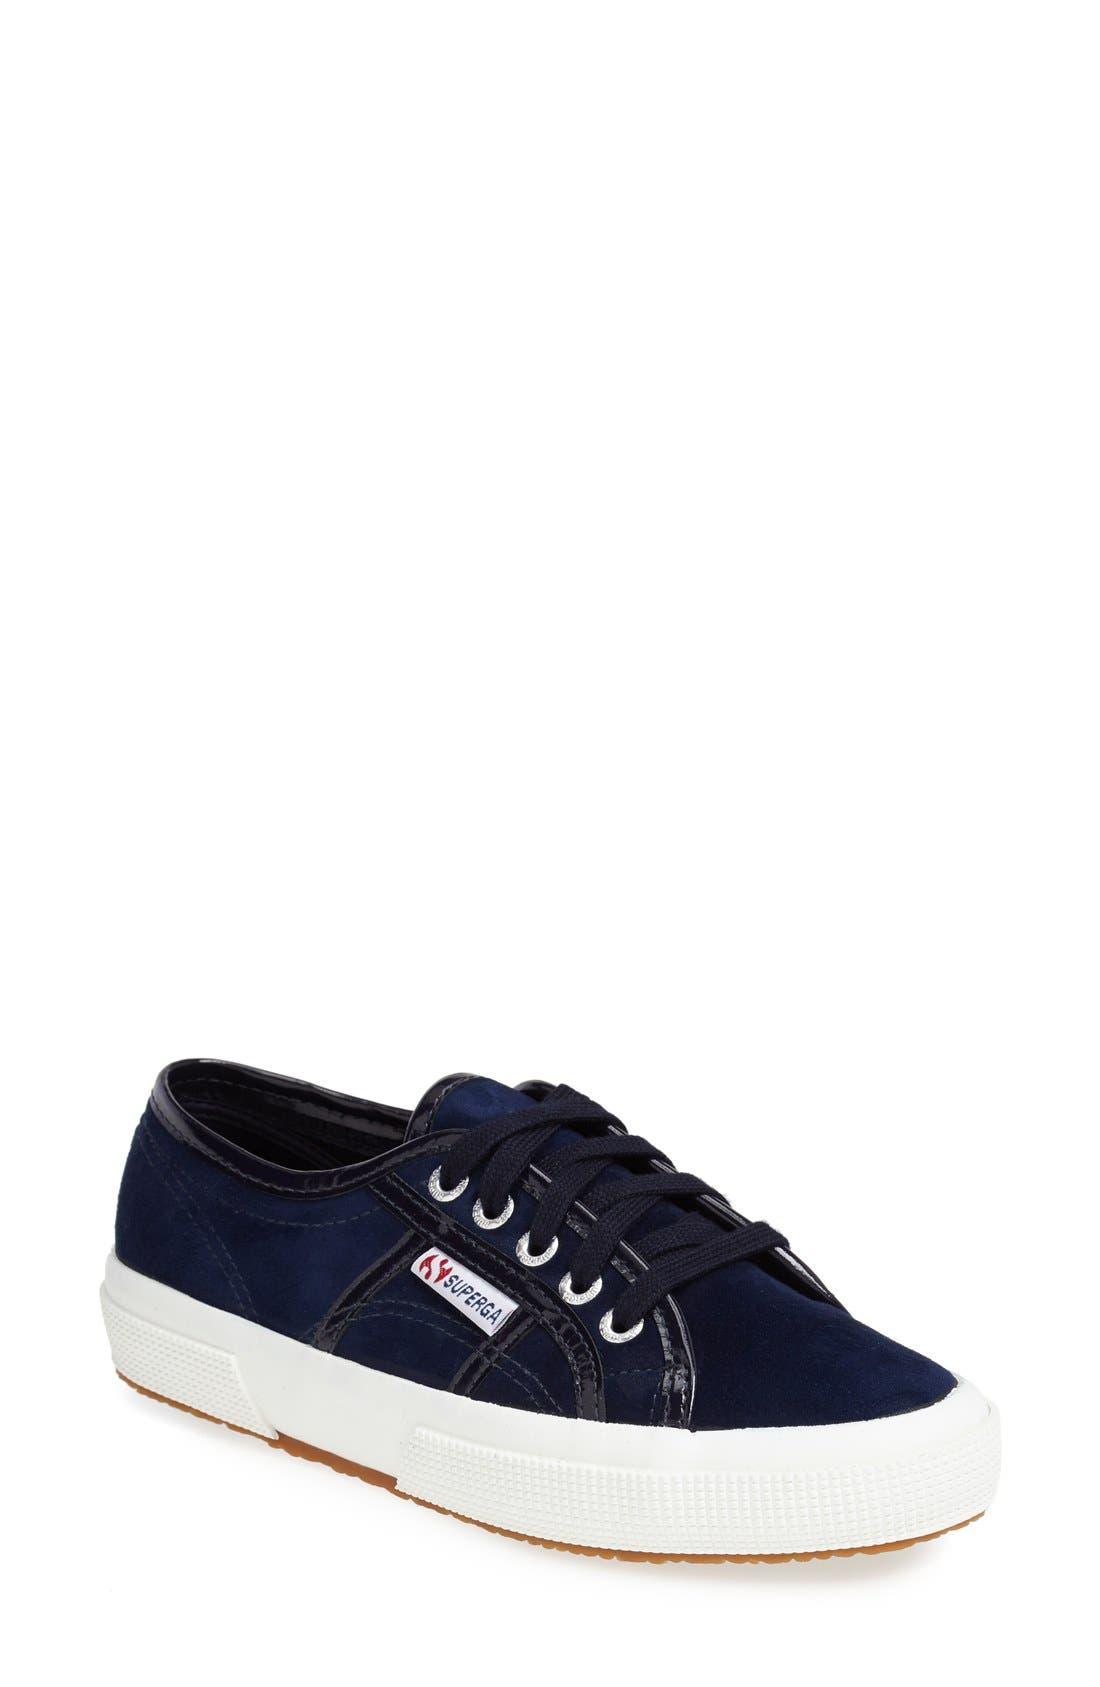 Alternate Image 1 Selected - Superga Suede Slip-On Sneaker (Women)